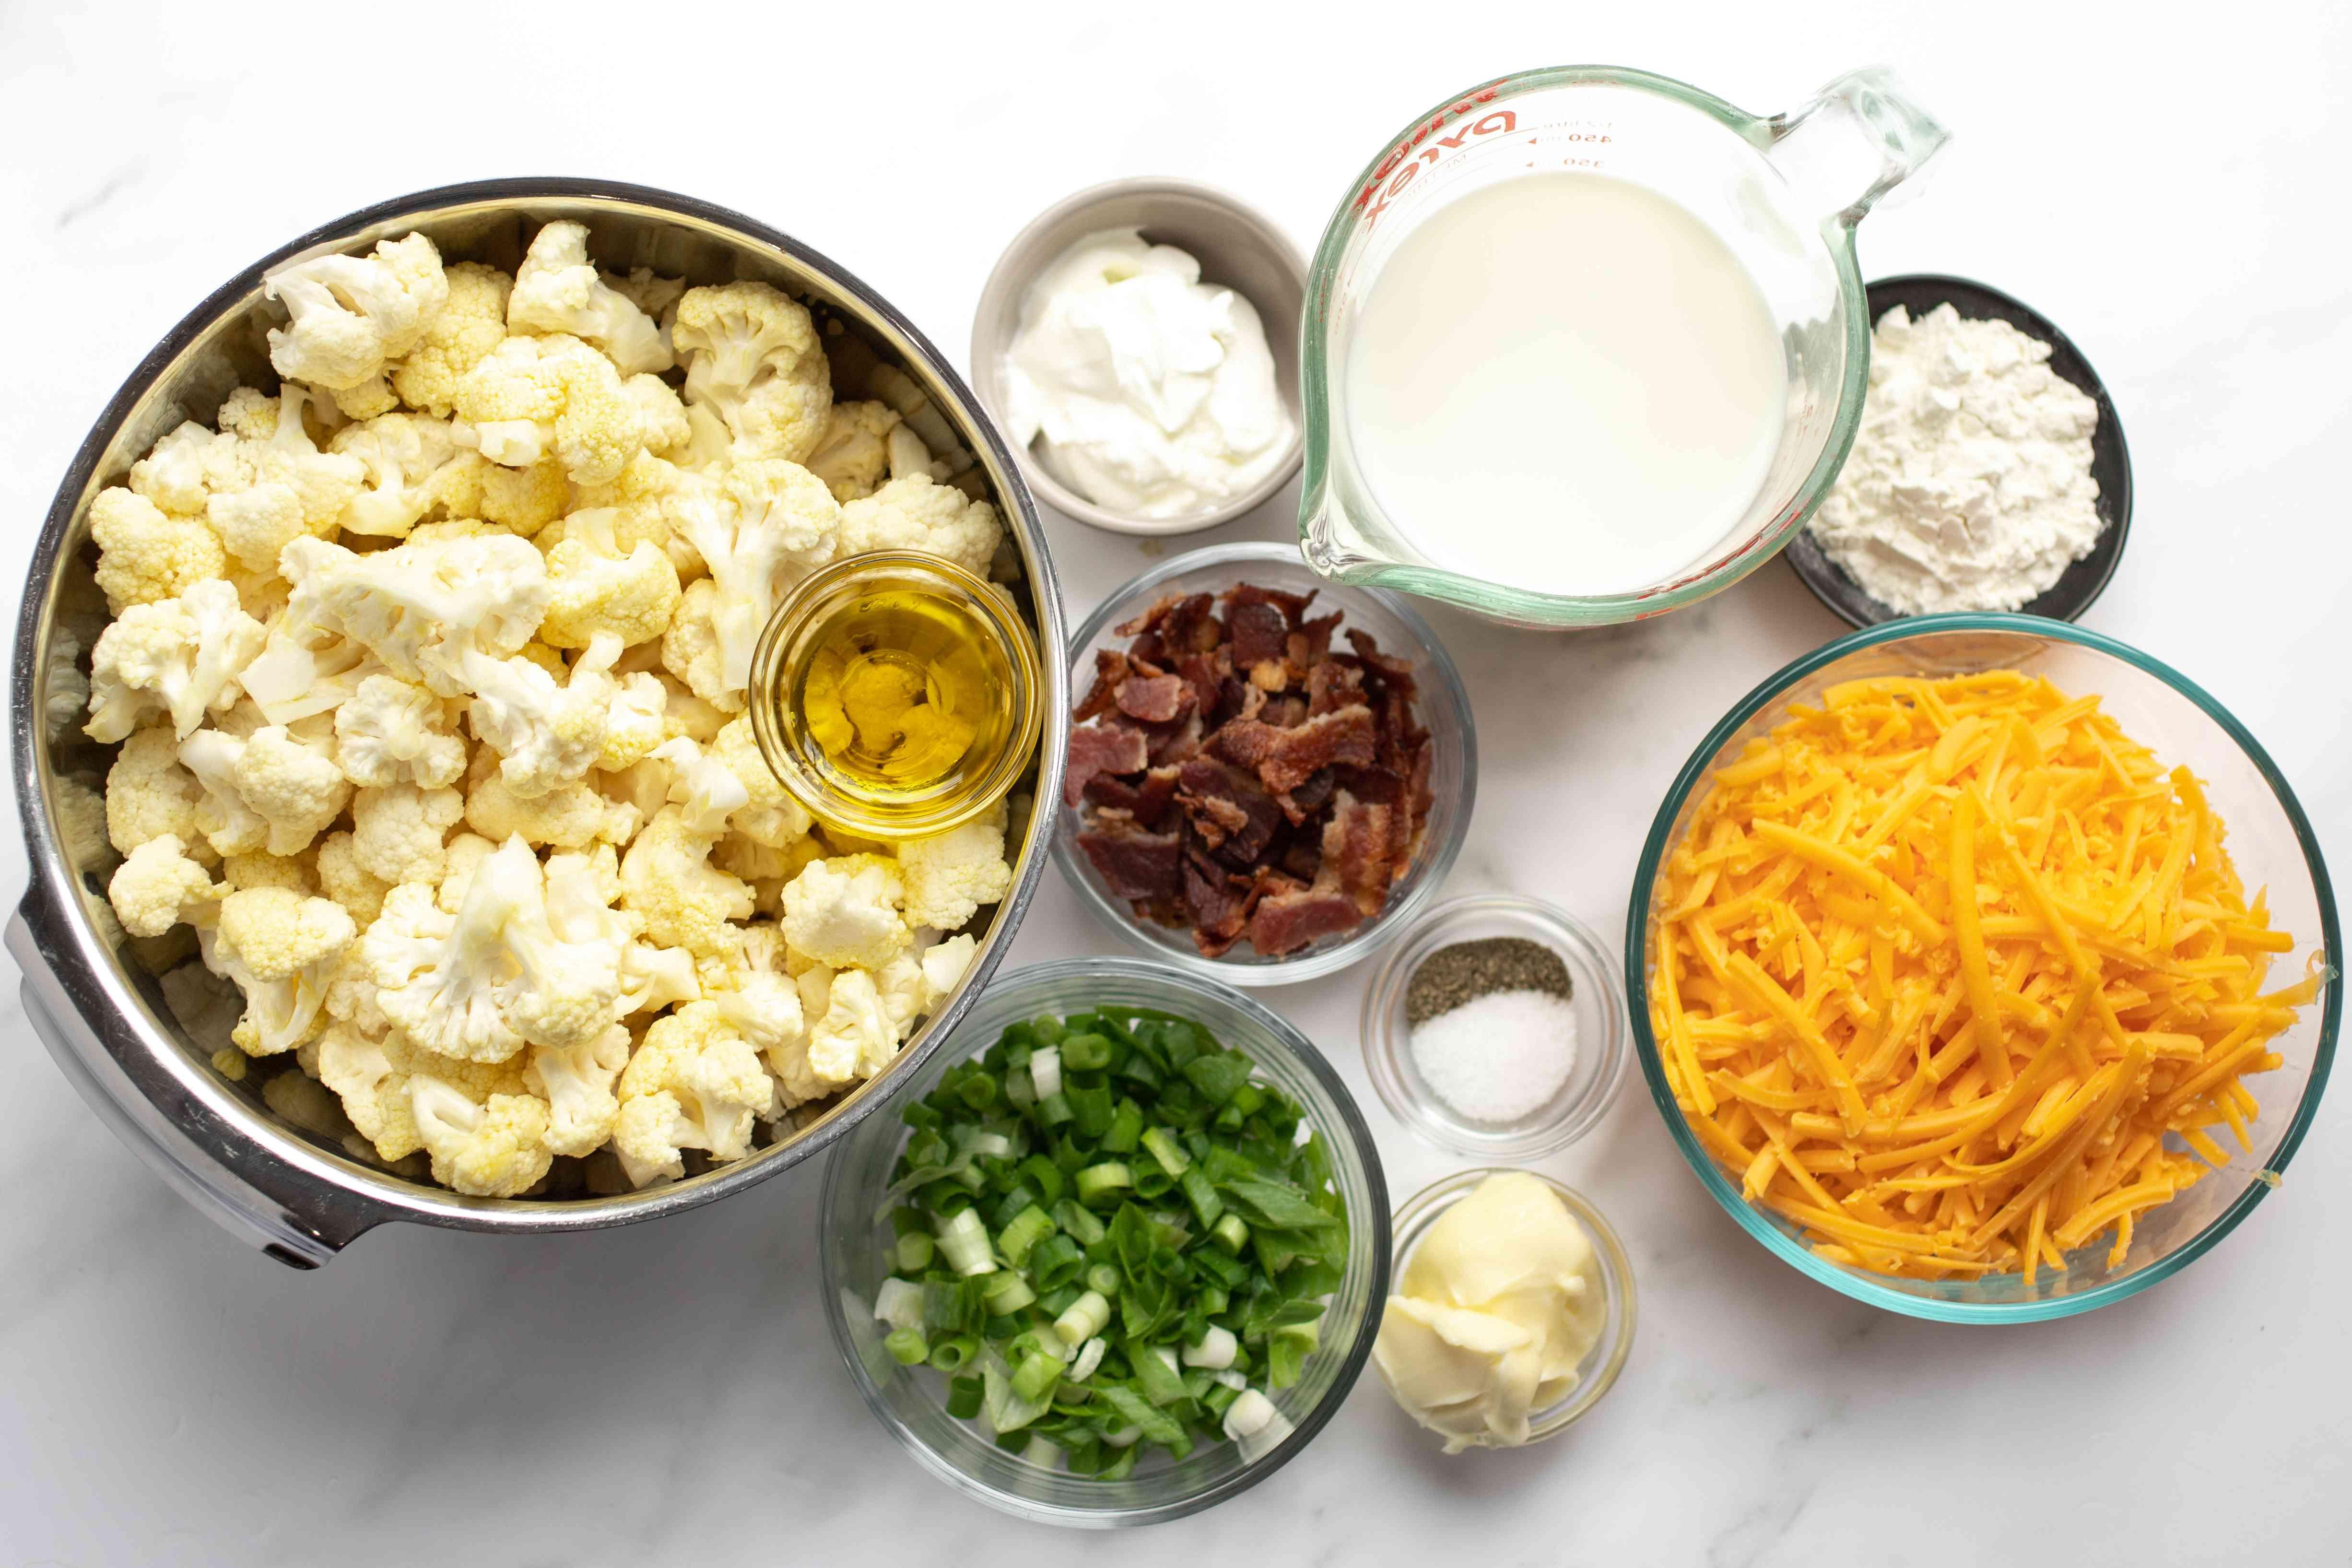 ingredients for loaded cauliflower bake